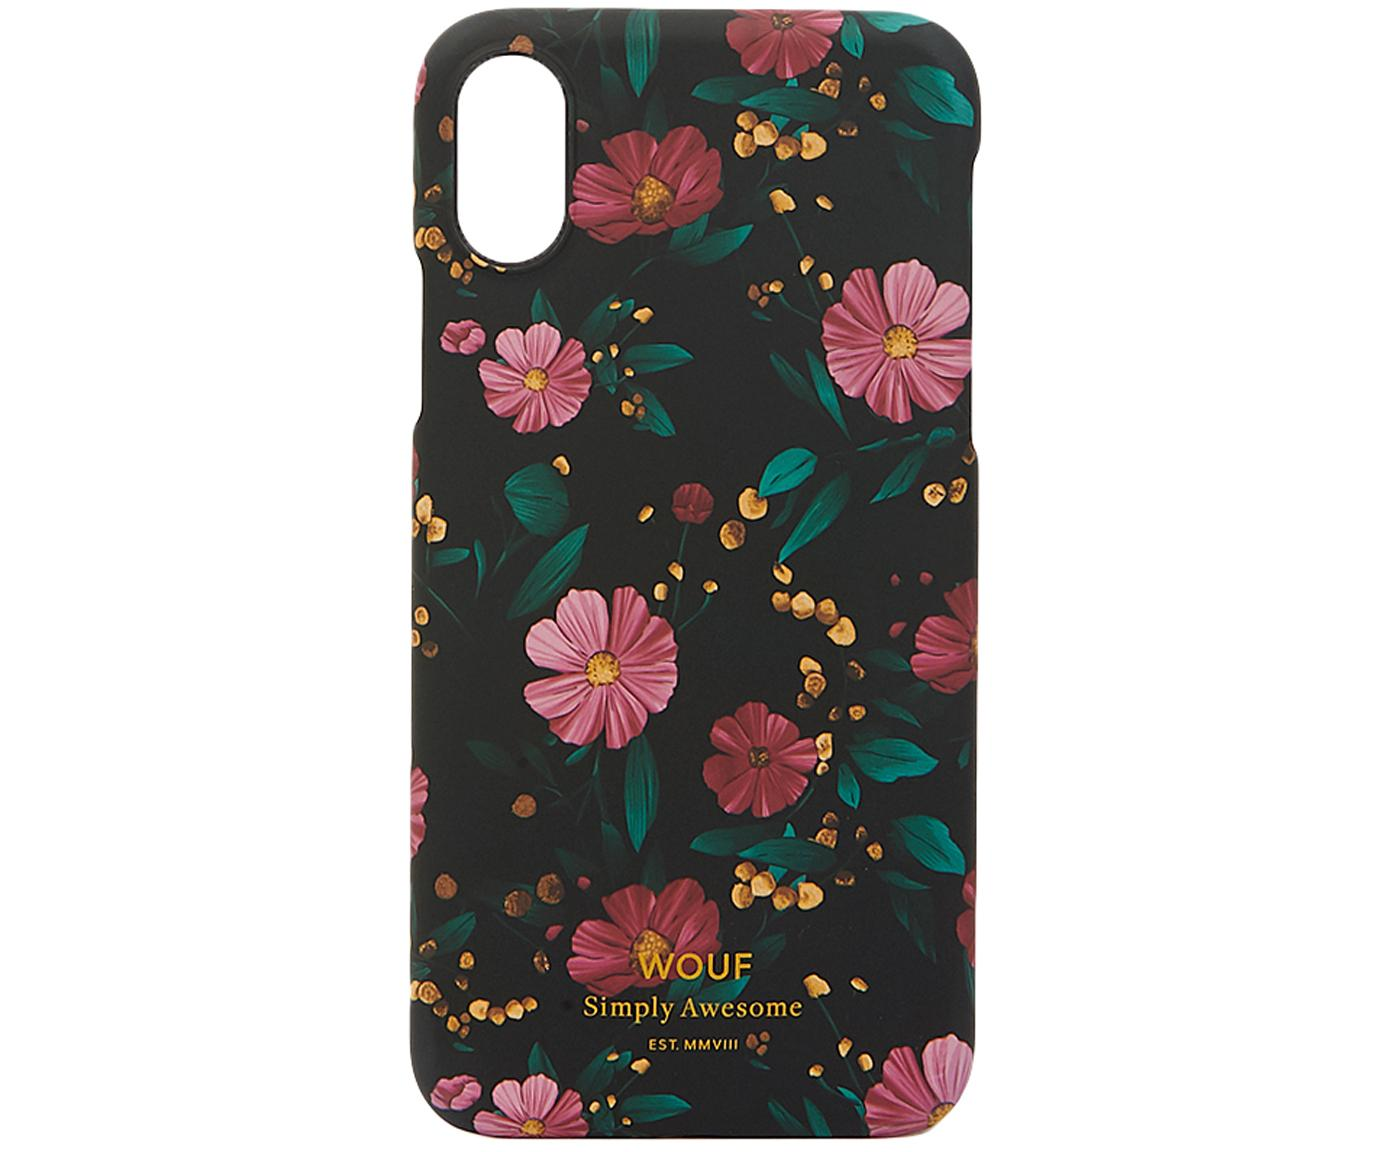 Funda para iPhoneX Black Flowers, Silicona, Multicolor, An 7 x Al 15 cm